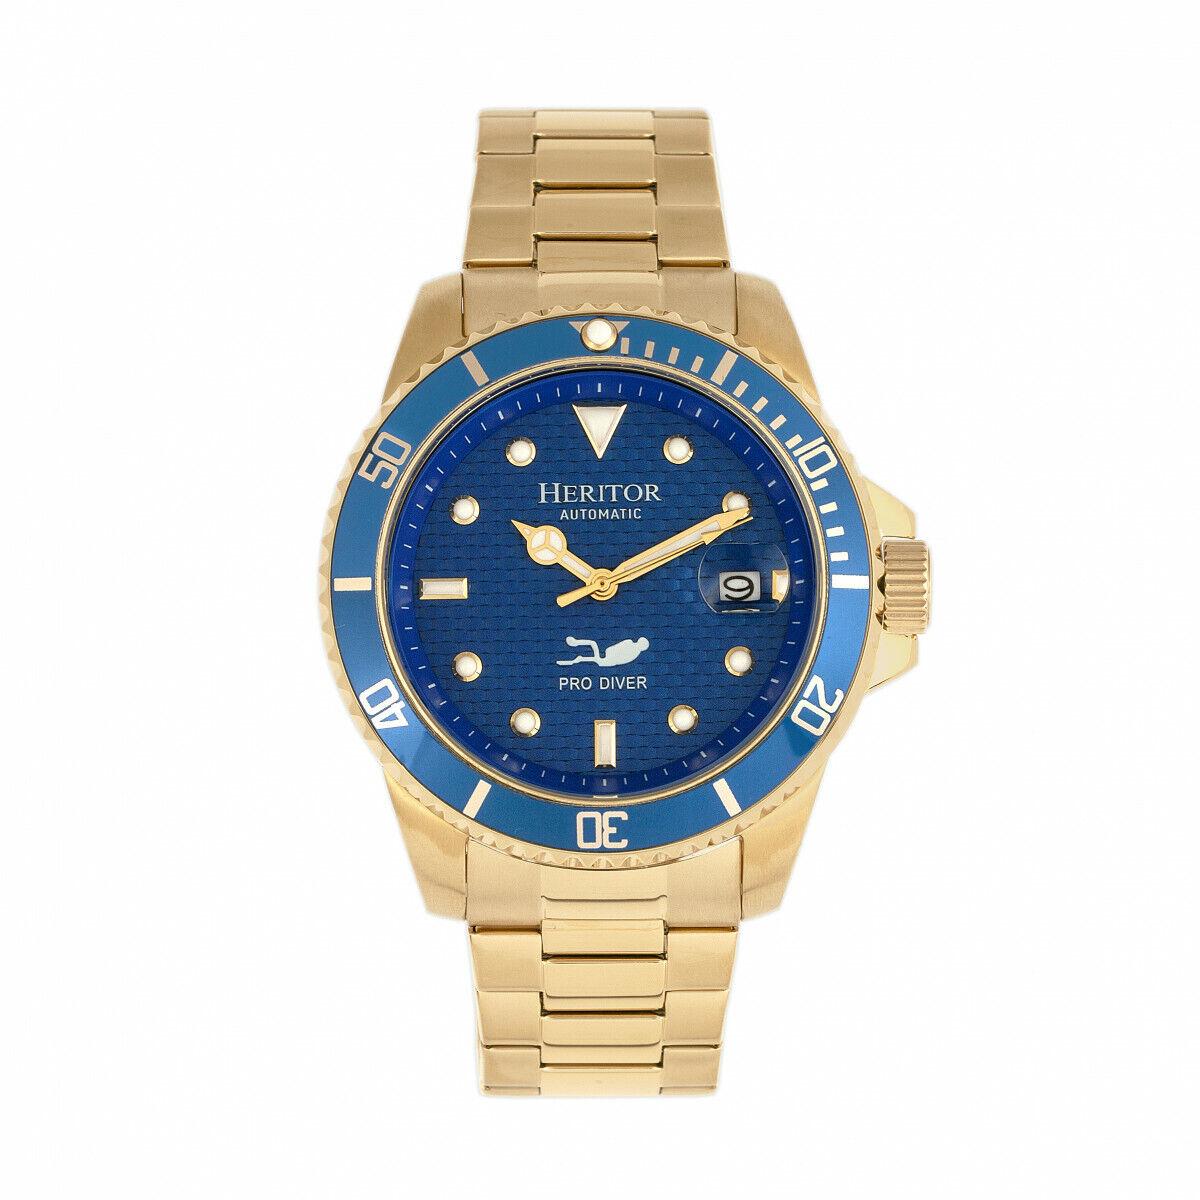 c798af6a9 Buy HERITOR Automatic Lucius Men's Pro Diver Gold Bracelet Watch W ...